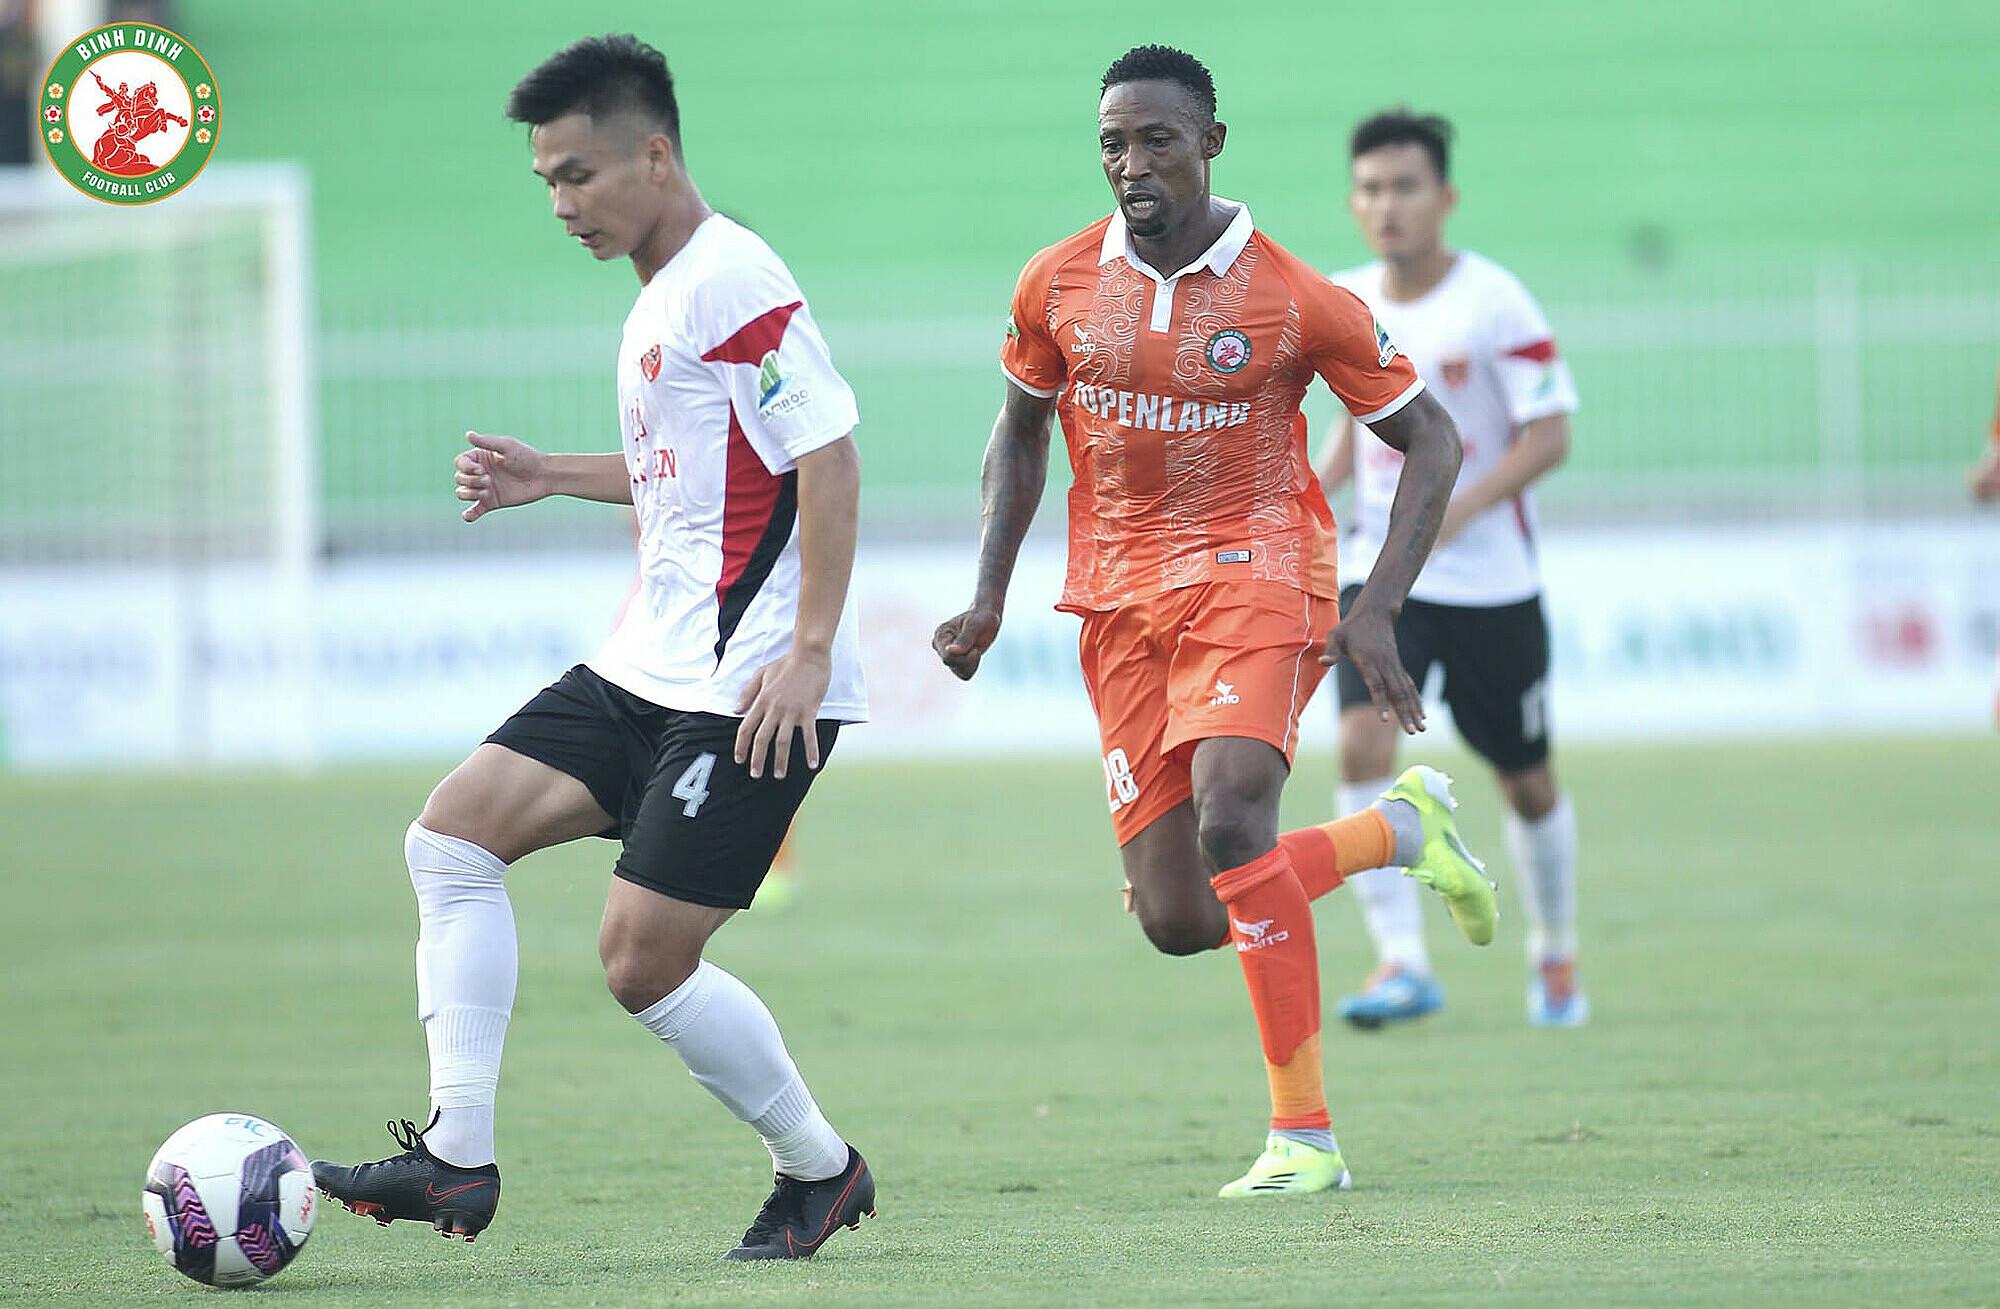 Dinh Hoang Max (28, หลัง) เล่นได้อย่างน่าประทับใจในการเปิดตัวของเขา แต่ไม่สามารถช่วยให้ Binh Dinh ชนะได้  ภาพ: Binh Dinh FC.